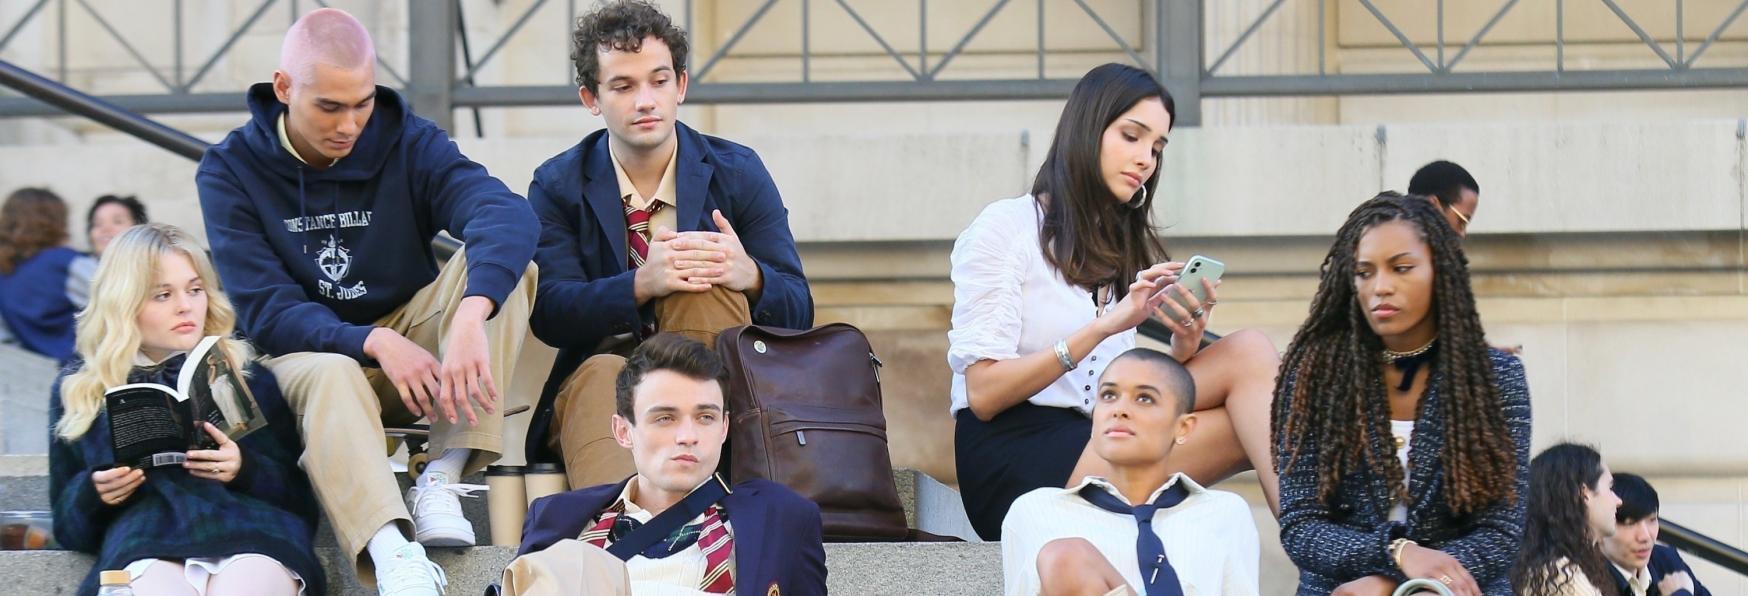 Gossip Girl 2: Rinnovata la Serie TV Reboot targata HBO Max